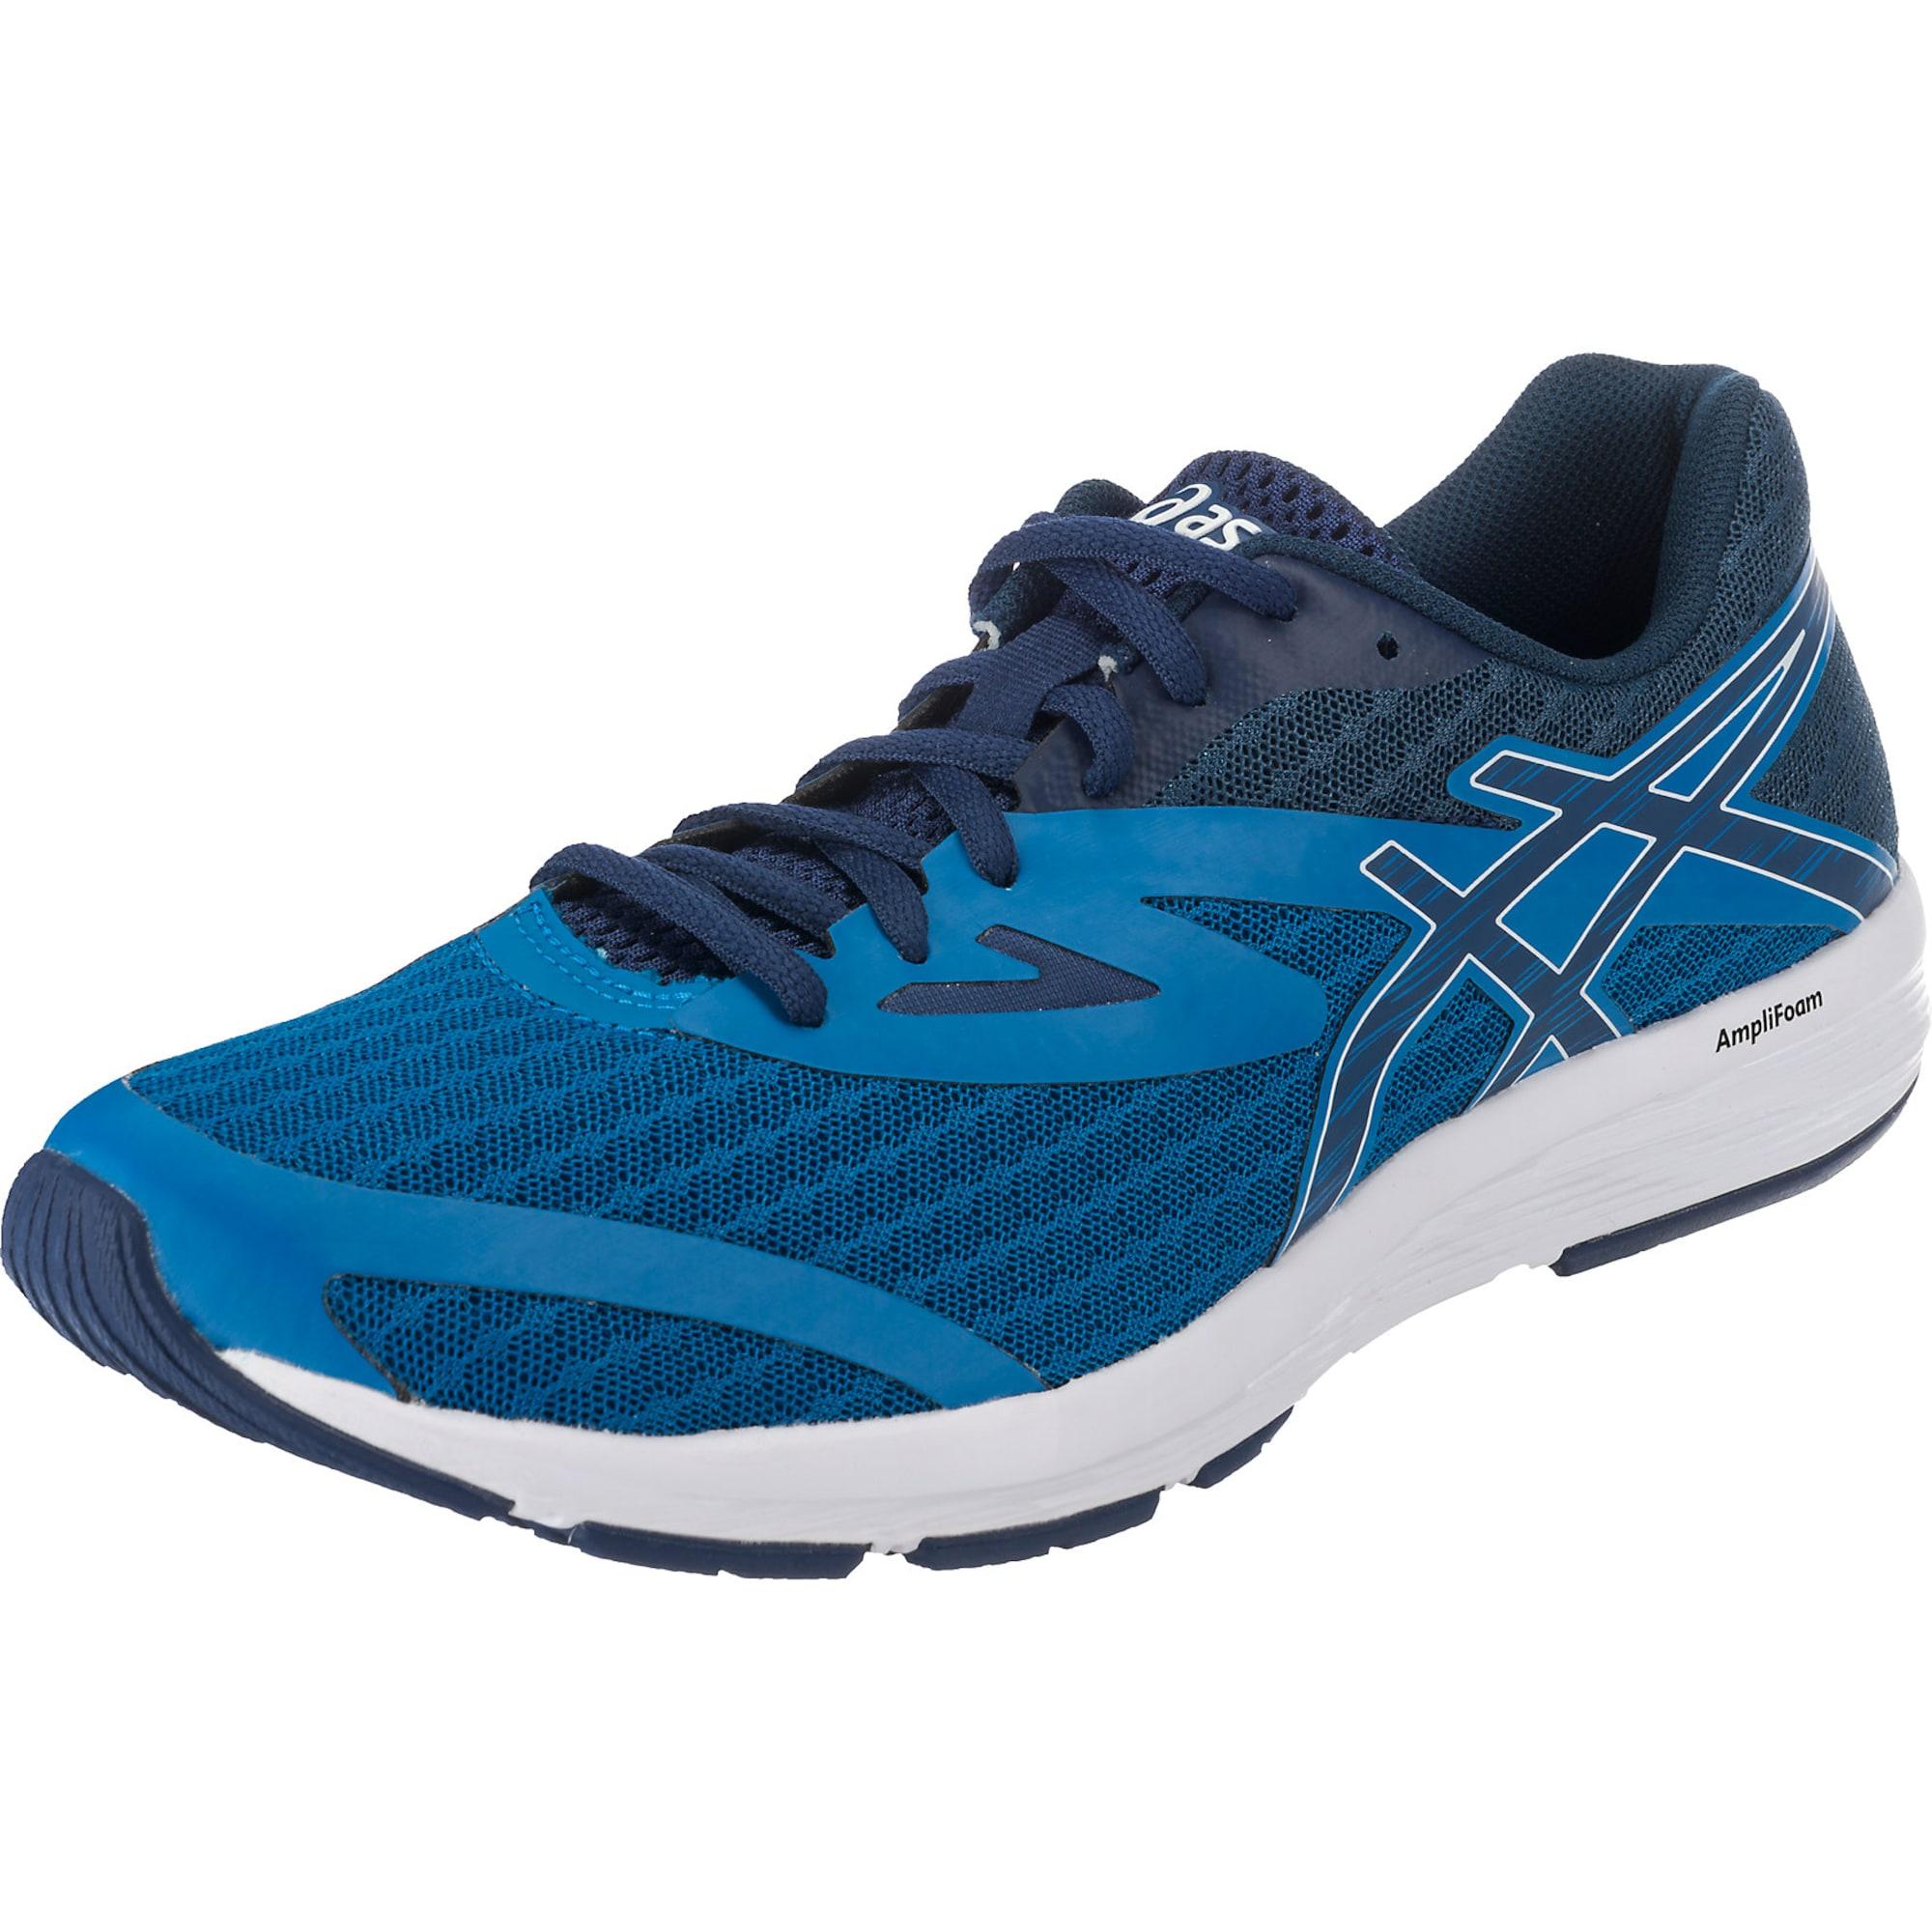 Laufschuhe 'AMPLICA' | Schuhe > Sportschuhe > Laufschuhe | Blau | ASICS